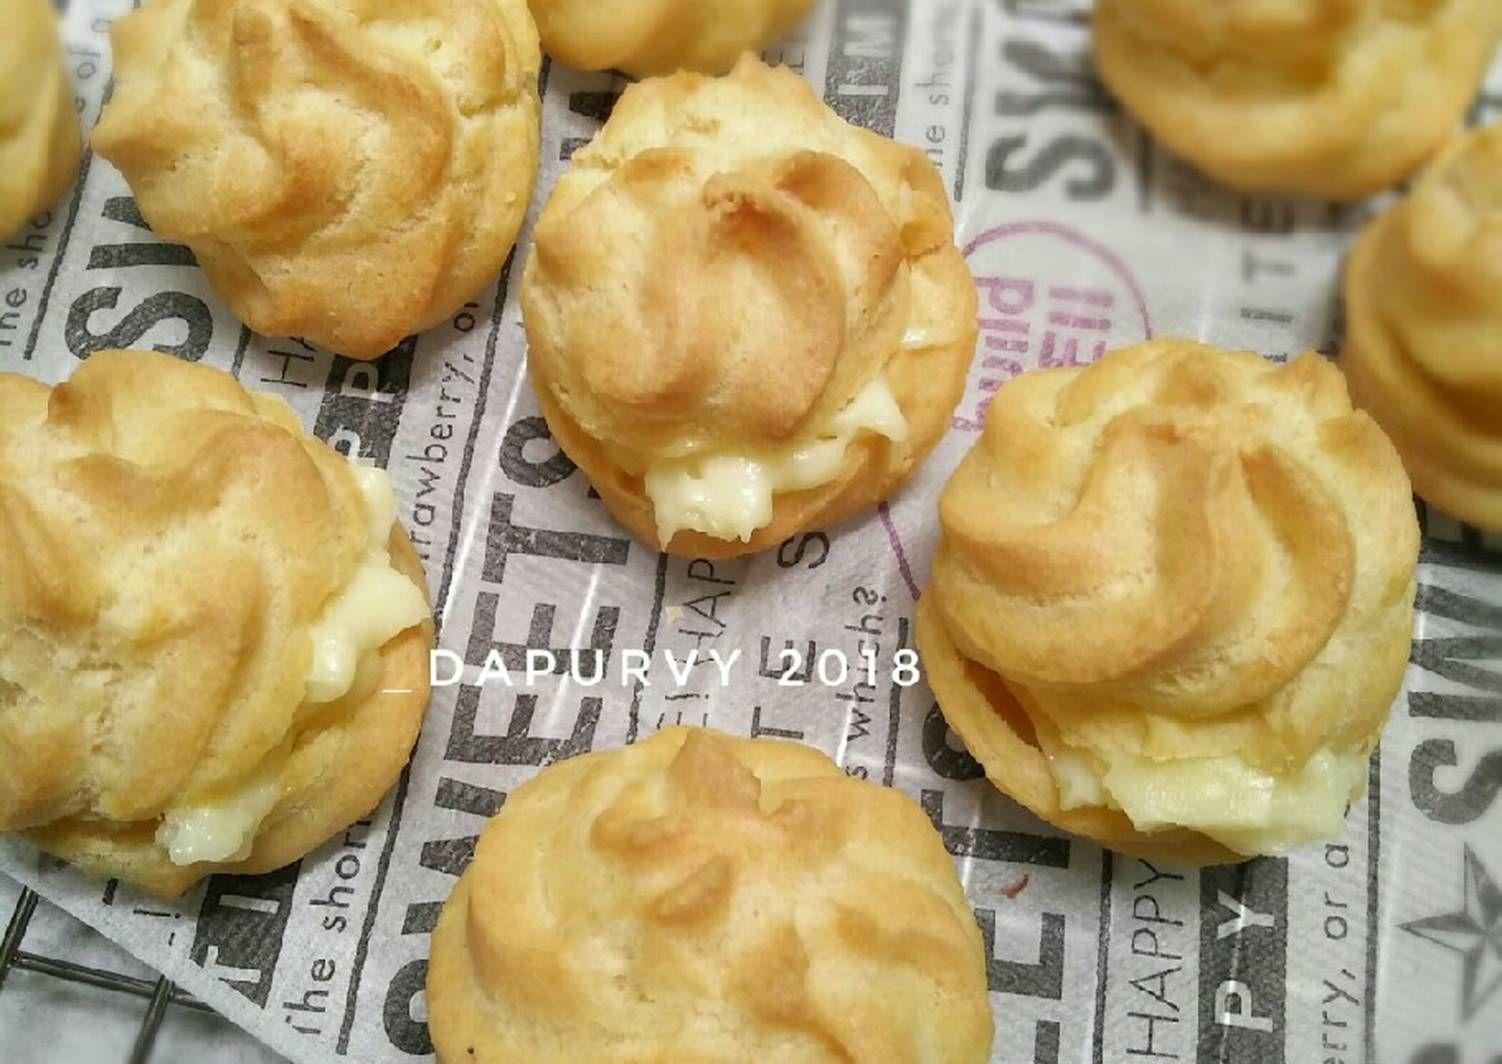 Resep Soes Vla Margarin Kokoh No Mixer Pr Soesbukansusi Oleh Dapurvy Resep Kue Camilan Kue Lezat Pudding Desserts